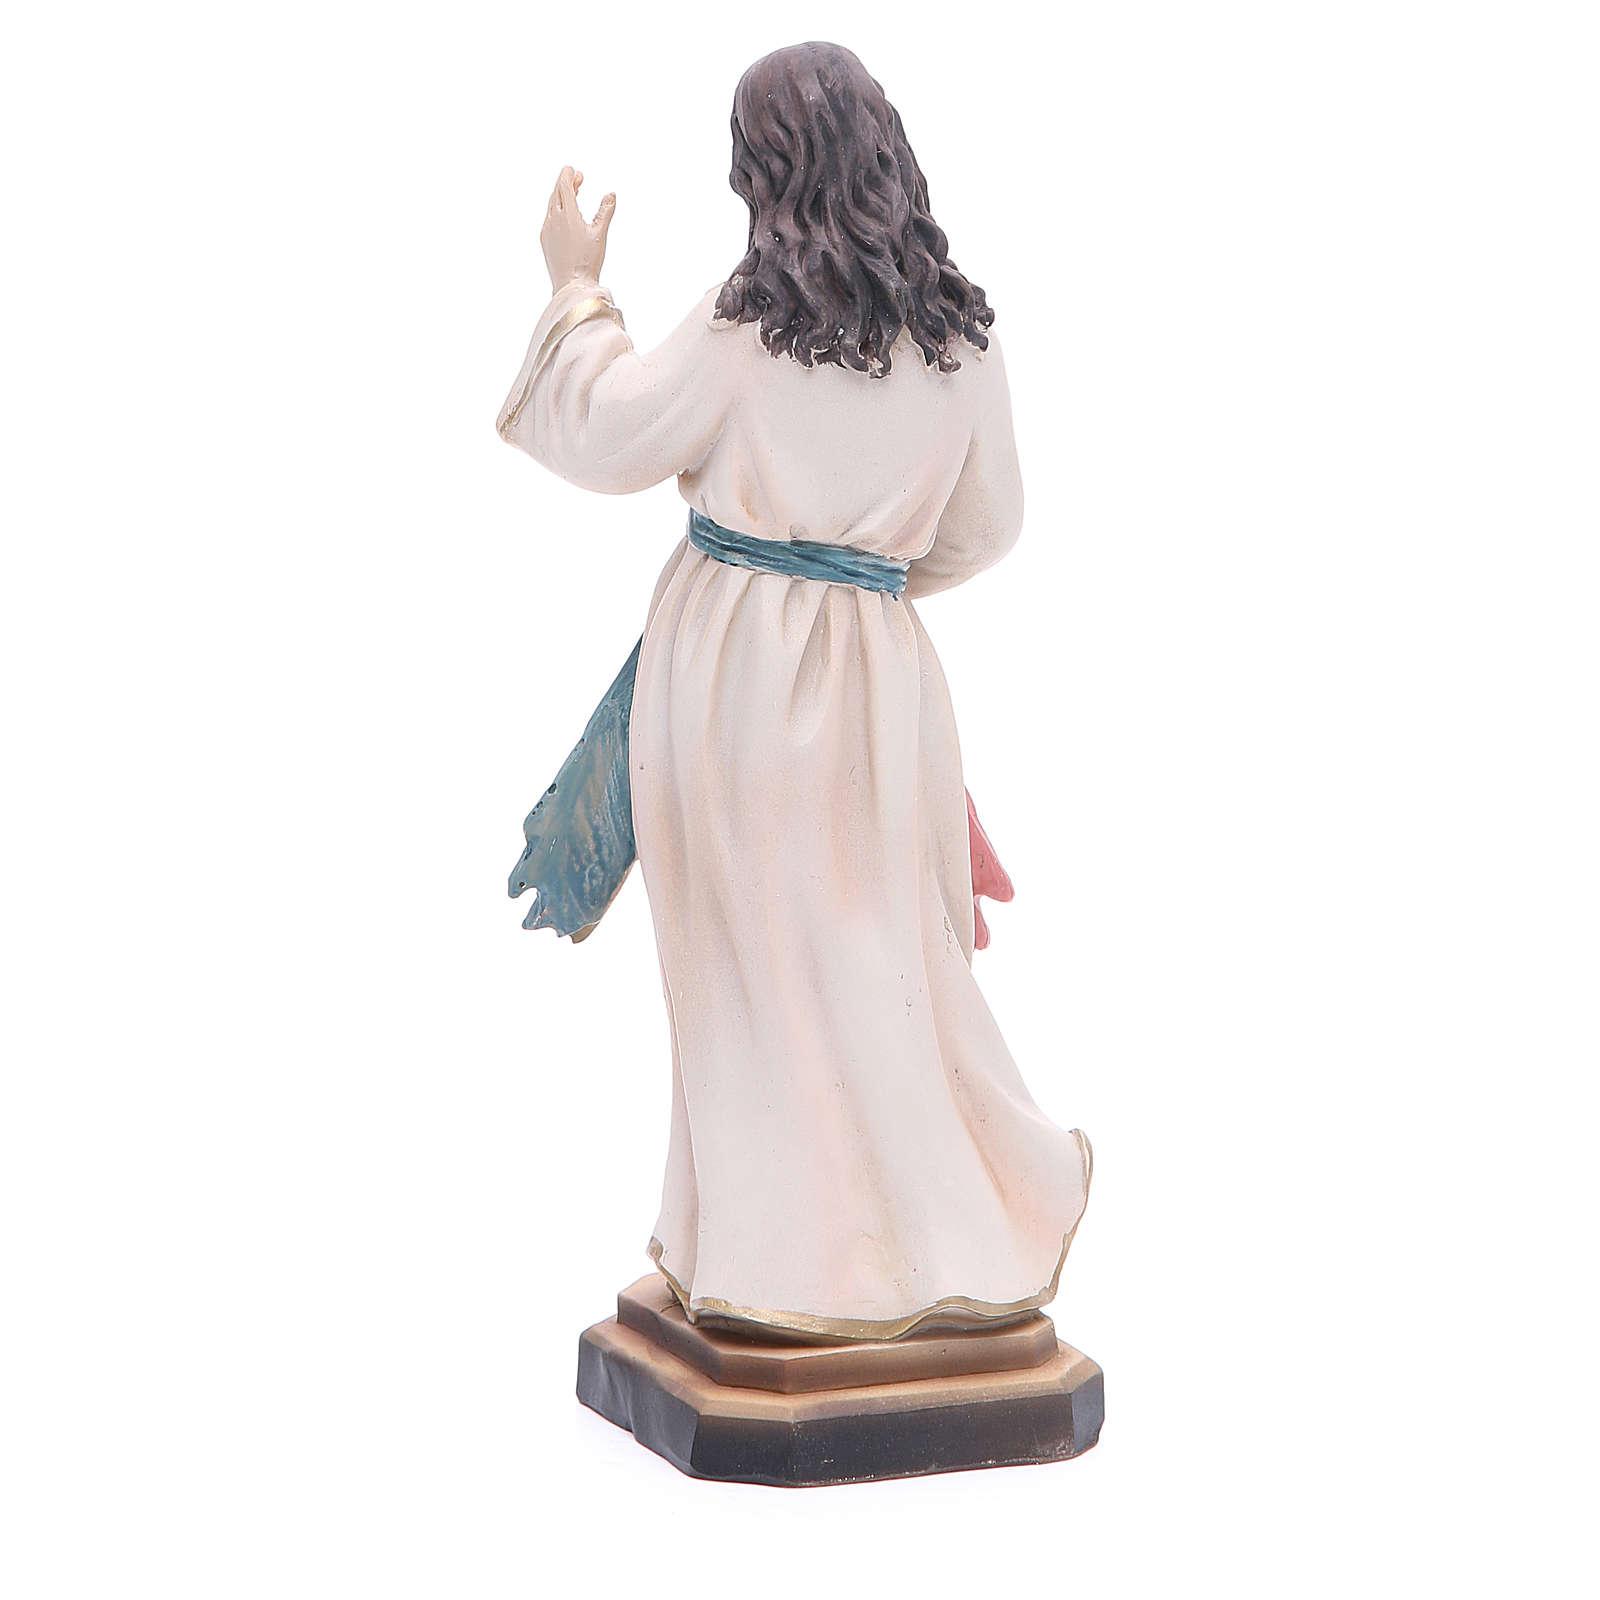 Statue Barmherziger Jesus 20.5 cm aus Kunstharz 4